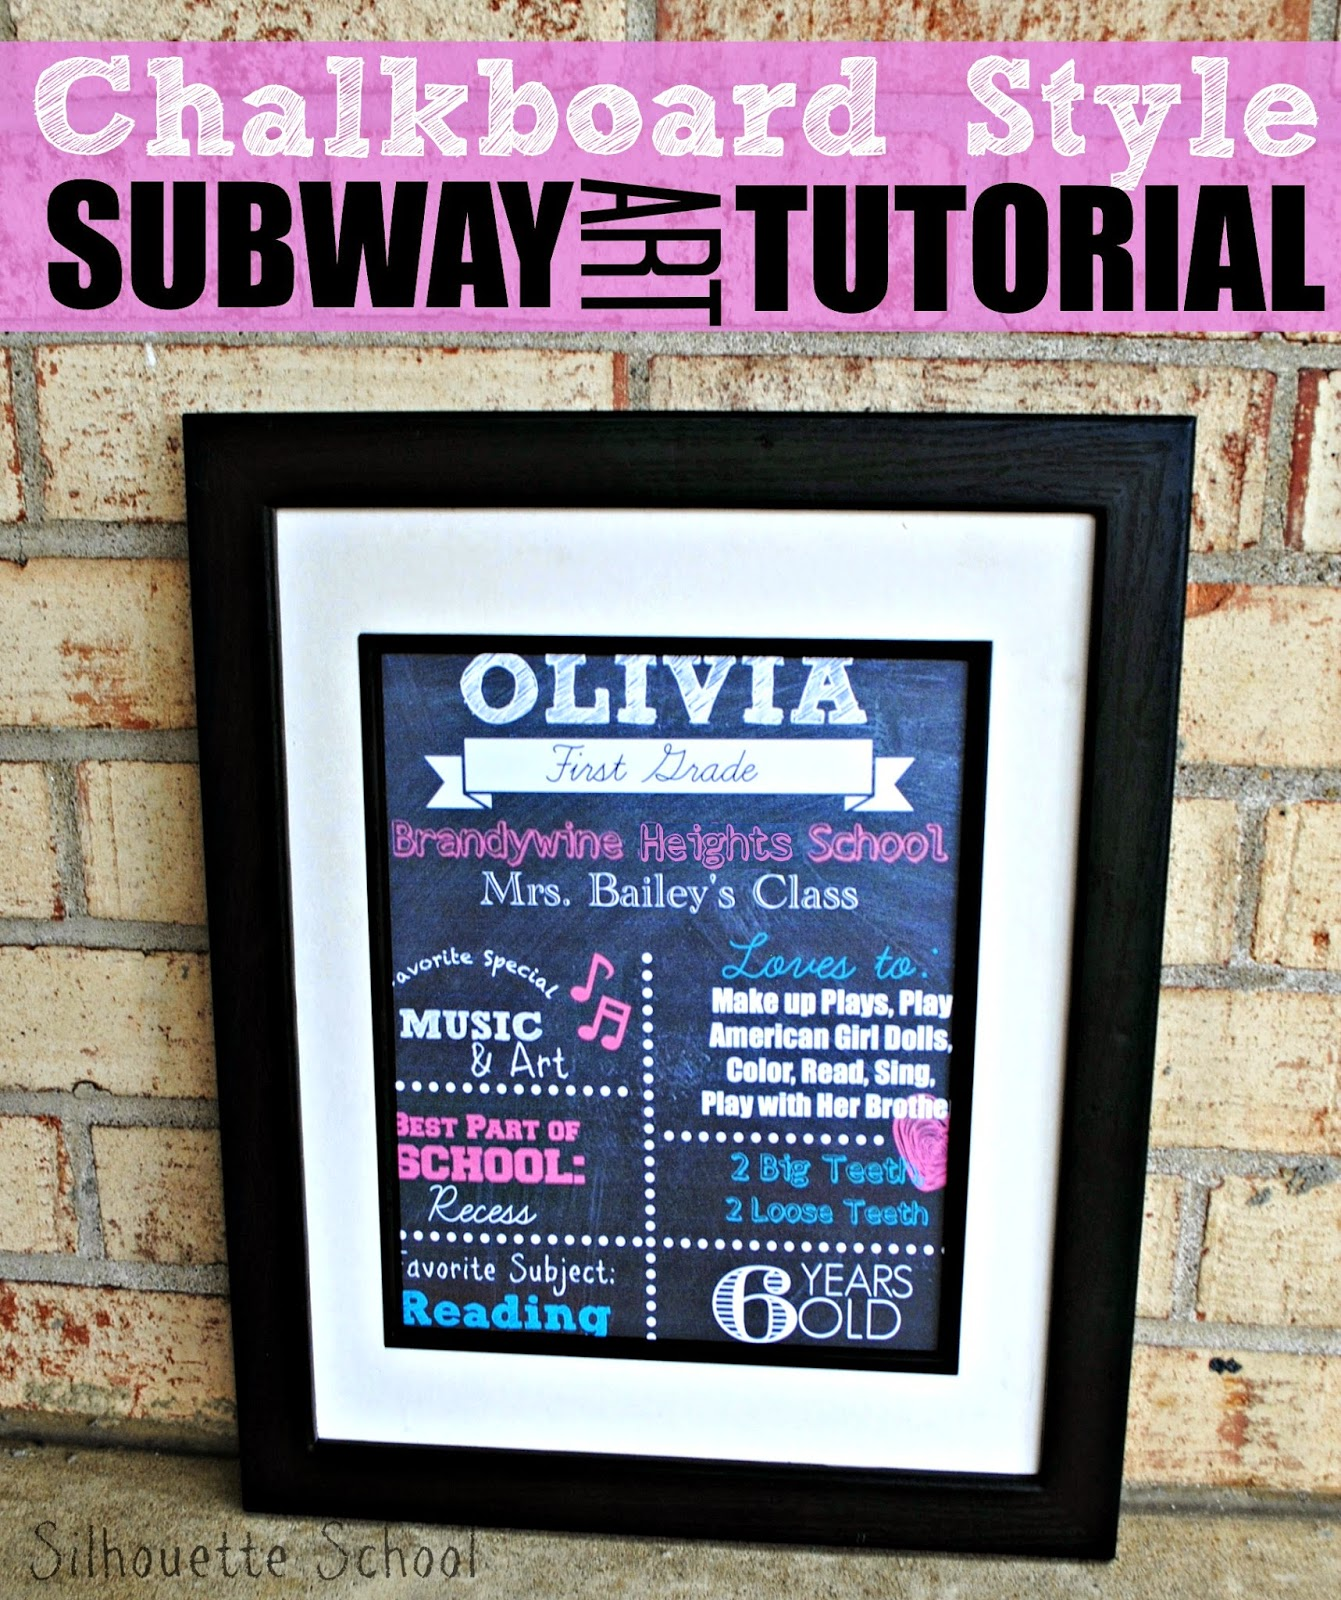 Subway art, chalkboard style, Silhouette tutorial, Silhouette Studio, PicMonkey